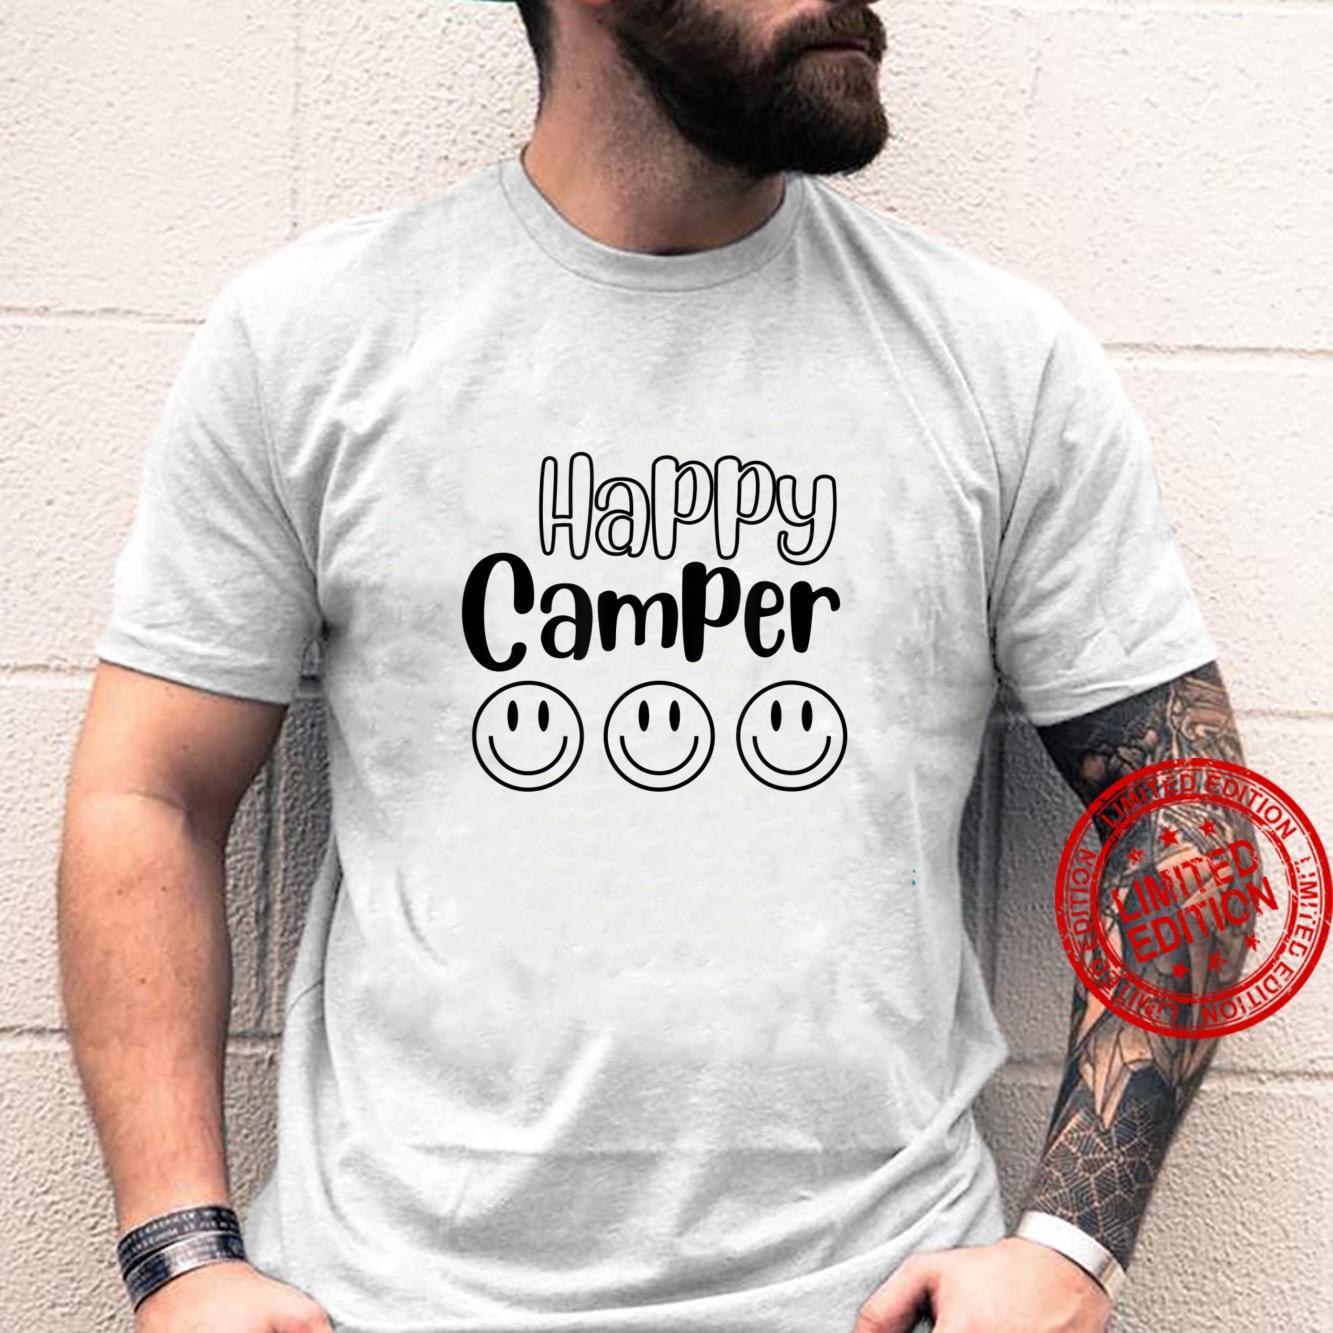 Happy Camper Smile Face Shirt